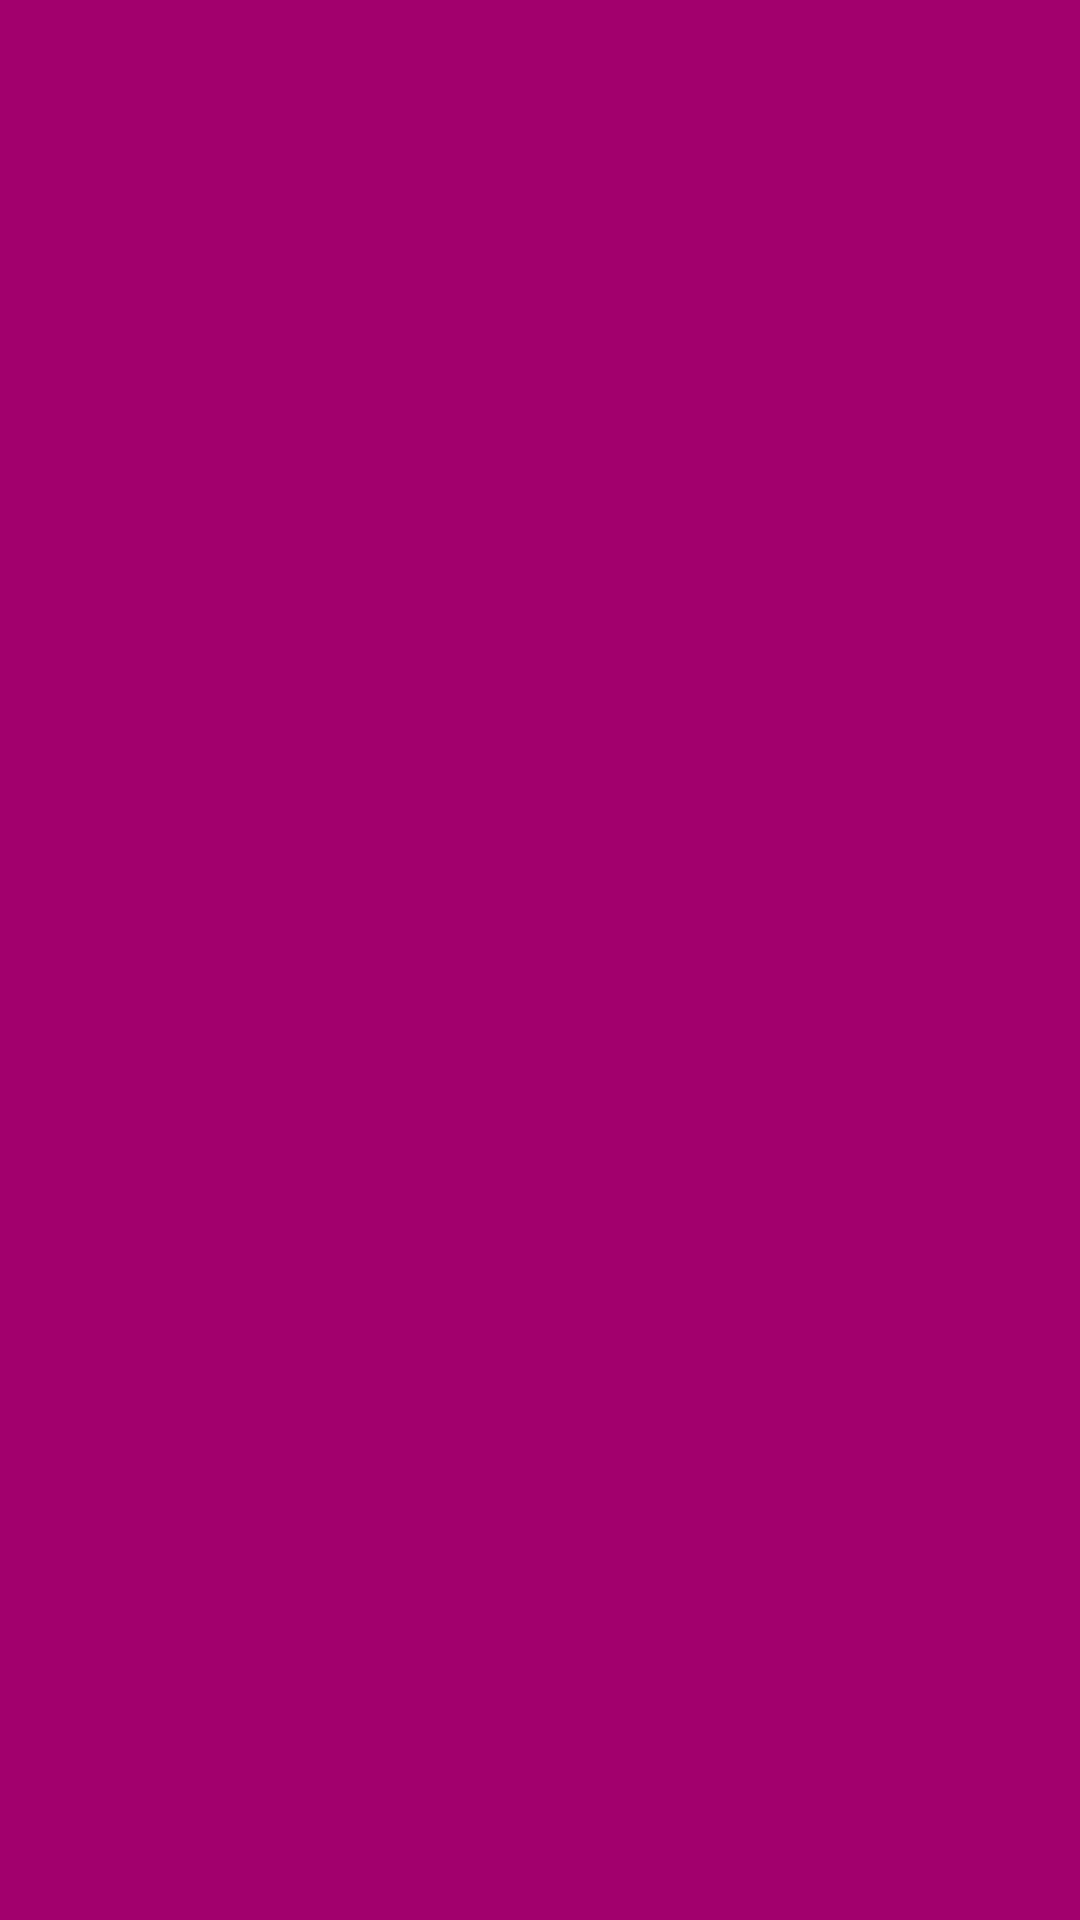 1080x1920 Flirt Solid Color Background